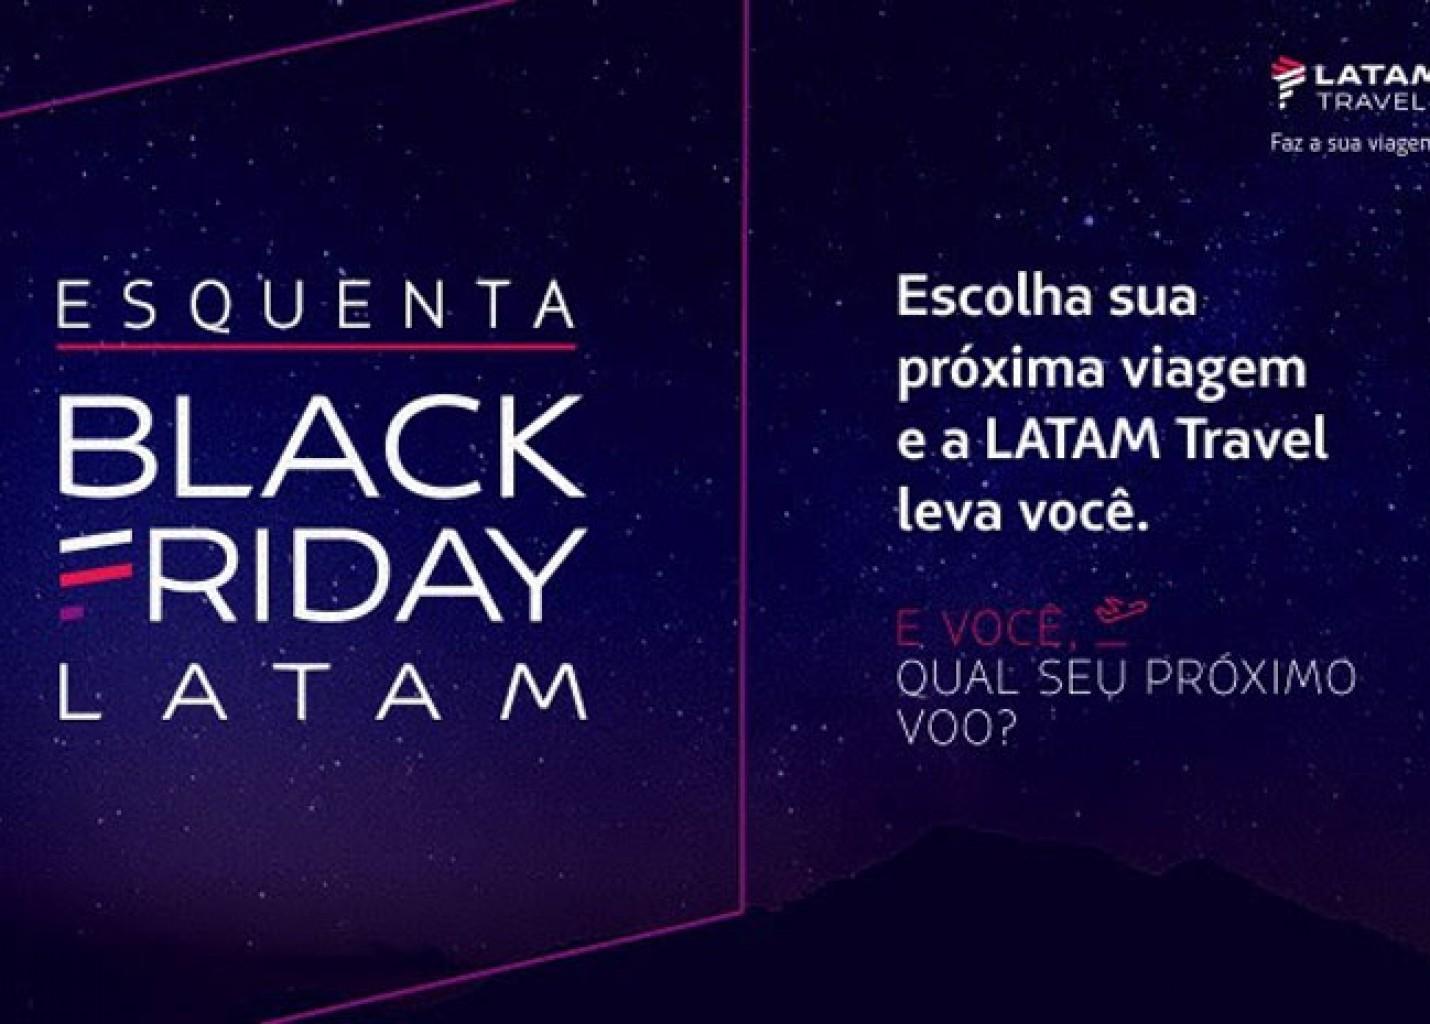 Black Friday: Latam anuncia campanha exclusiva nas redes sociais